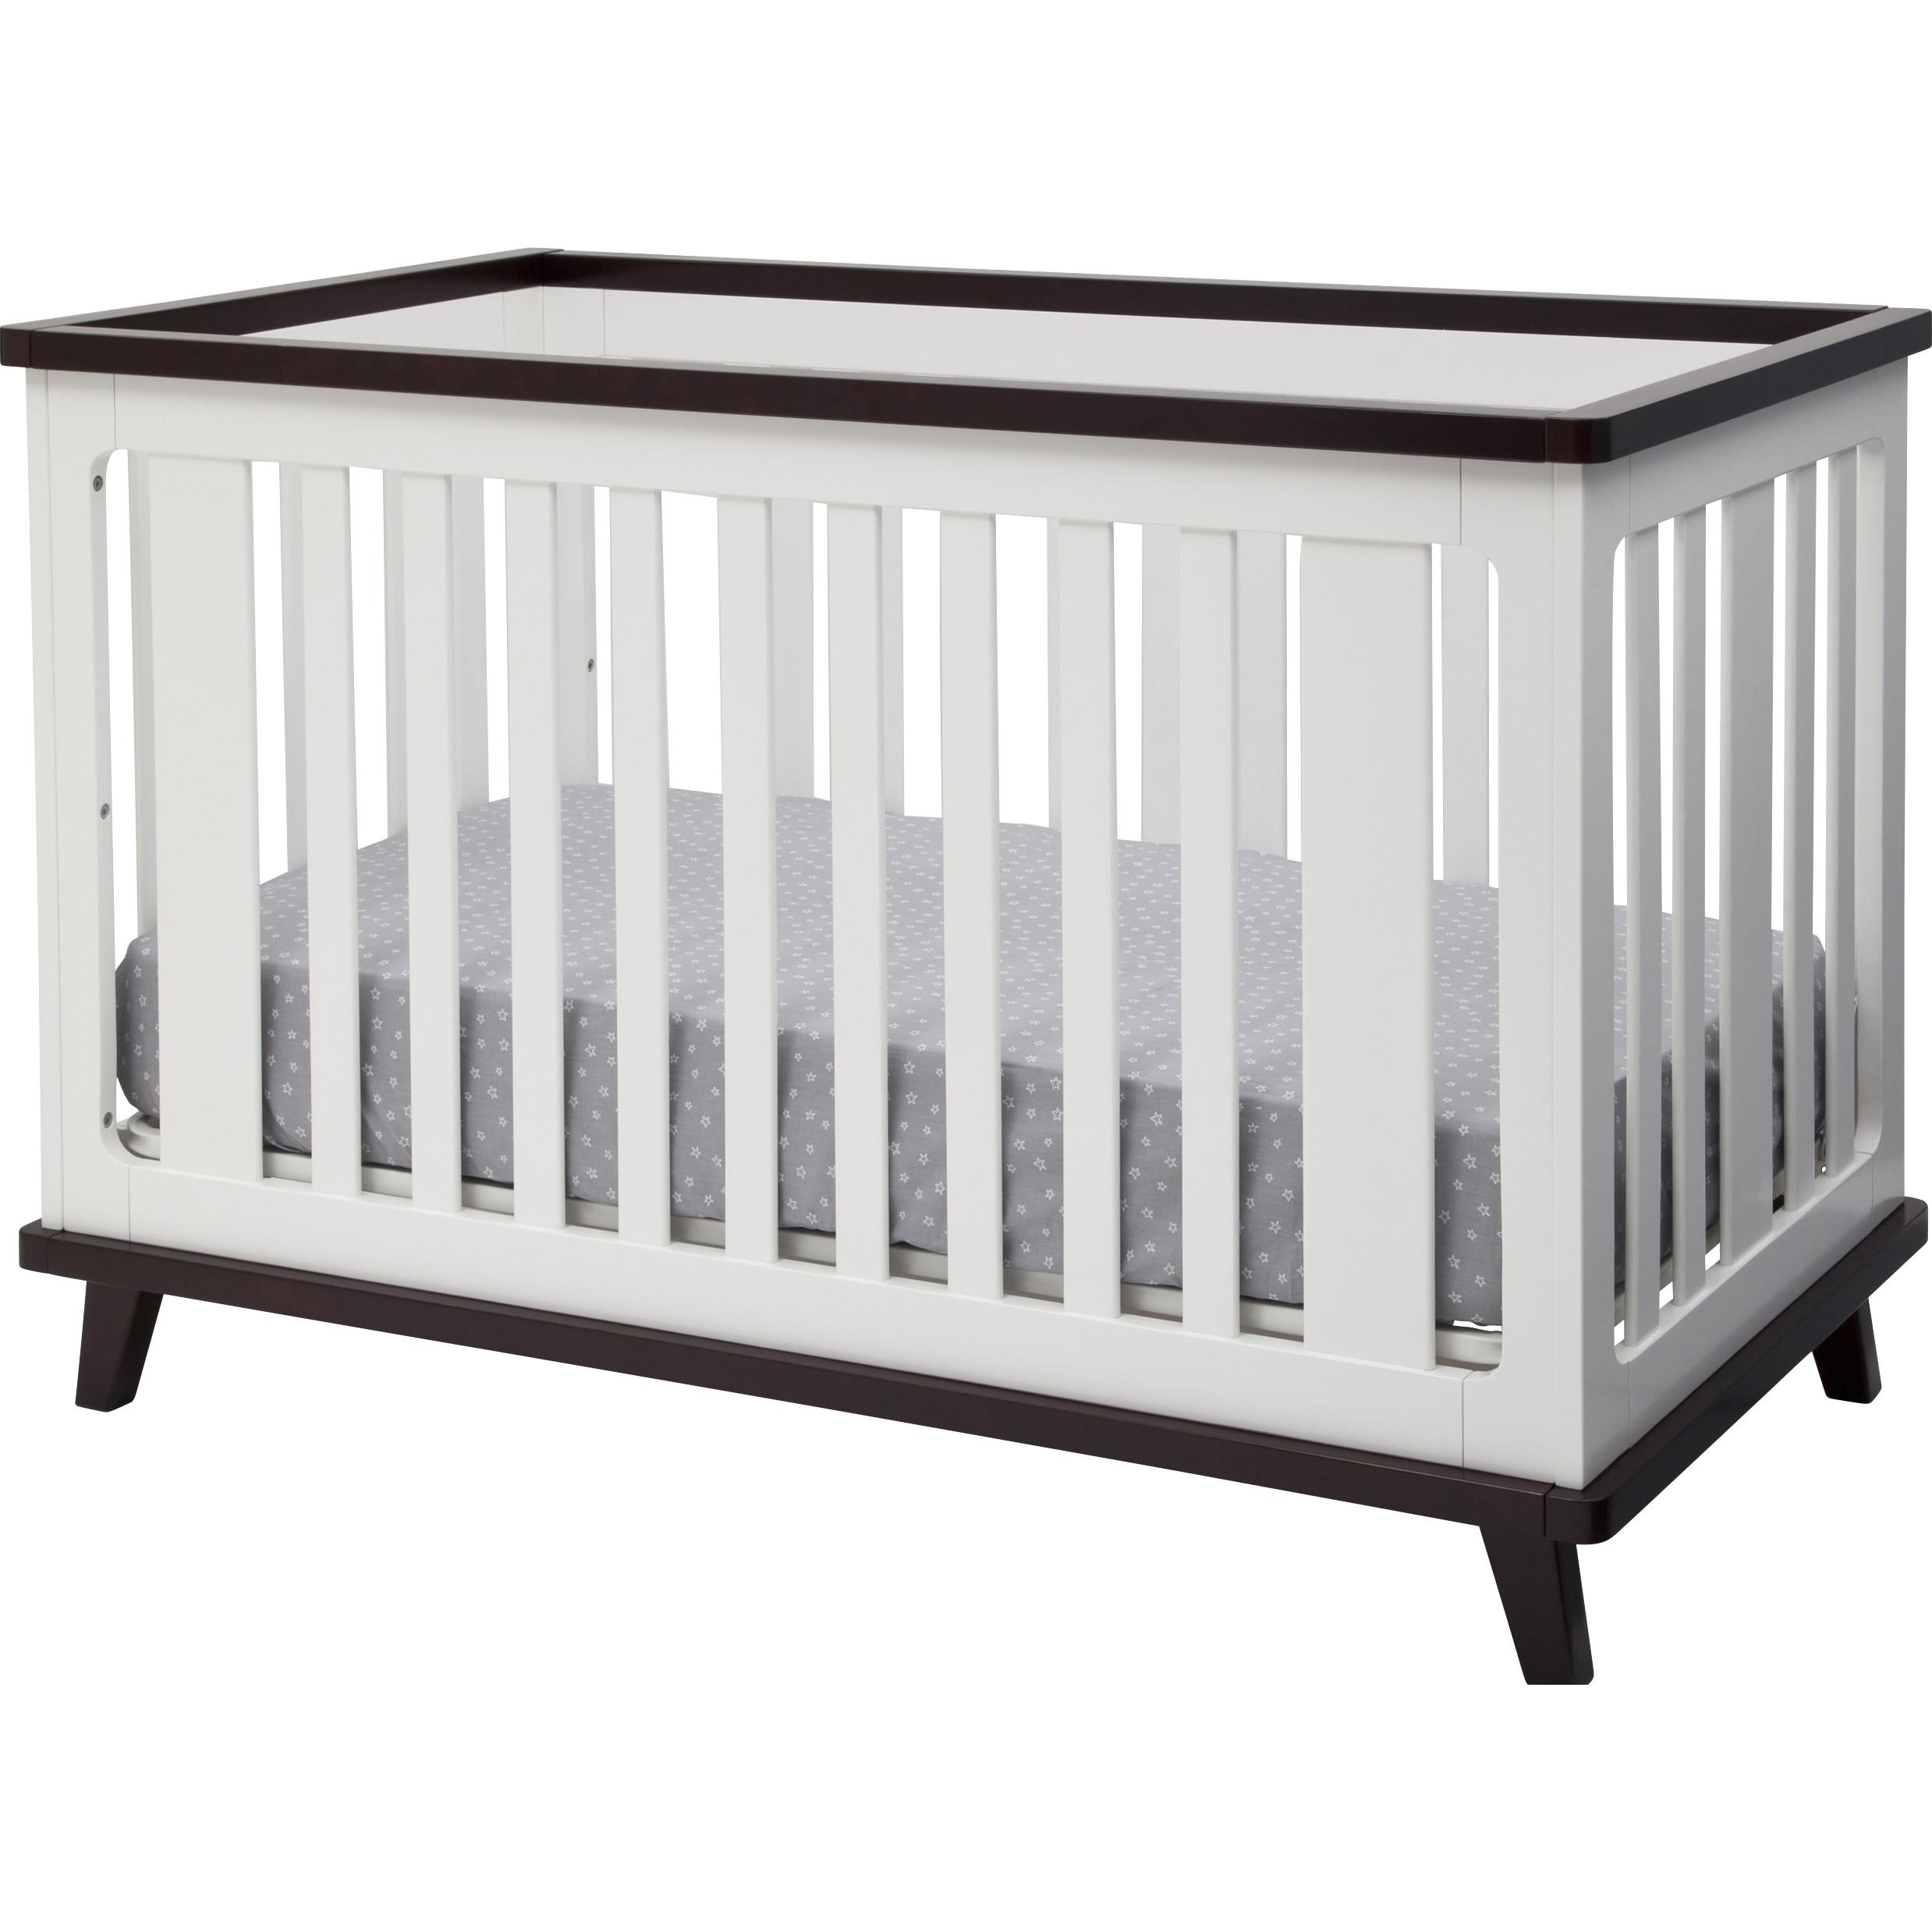 lind poppy baby regency convertible crib jenny davinci cribs in